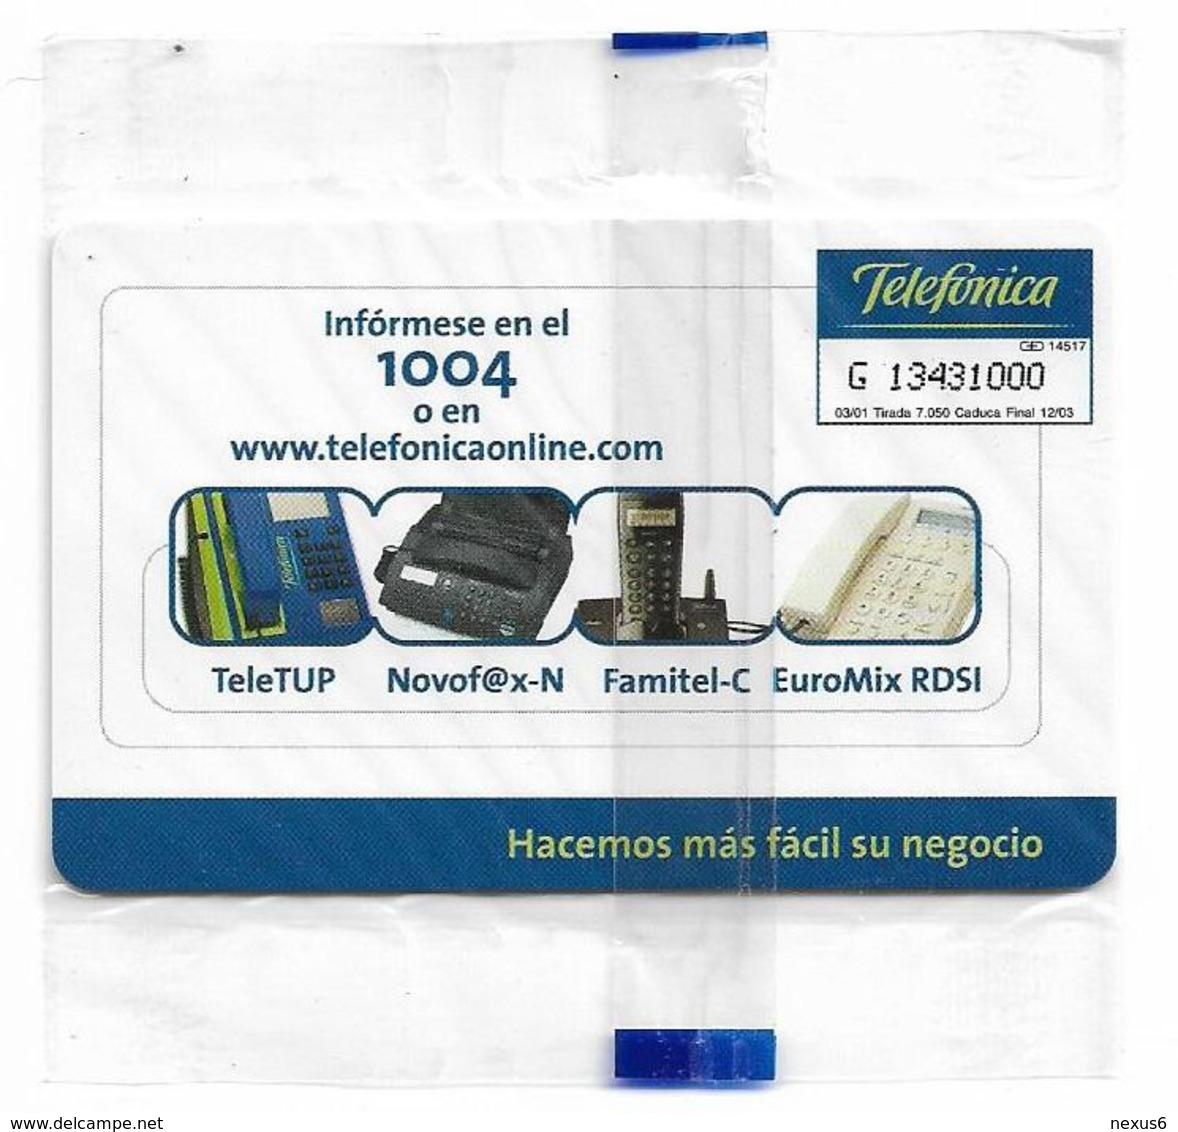 Spain - Telefónica - Com. Entre Profesional #1 - P-456 - 03.2001, 500PTA, 7.050ex, NSB - España